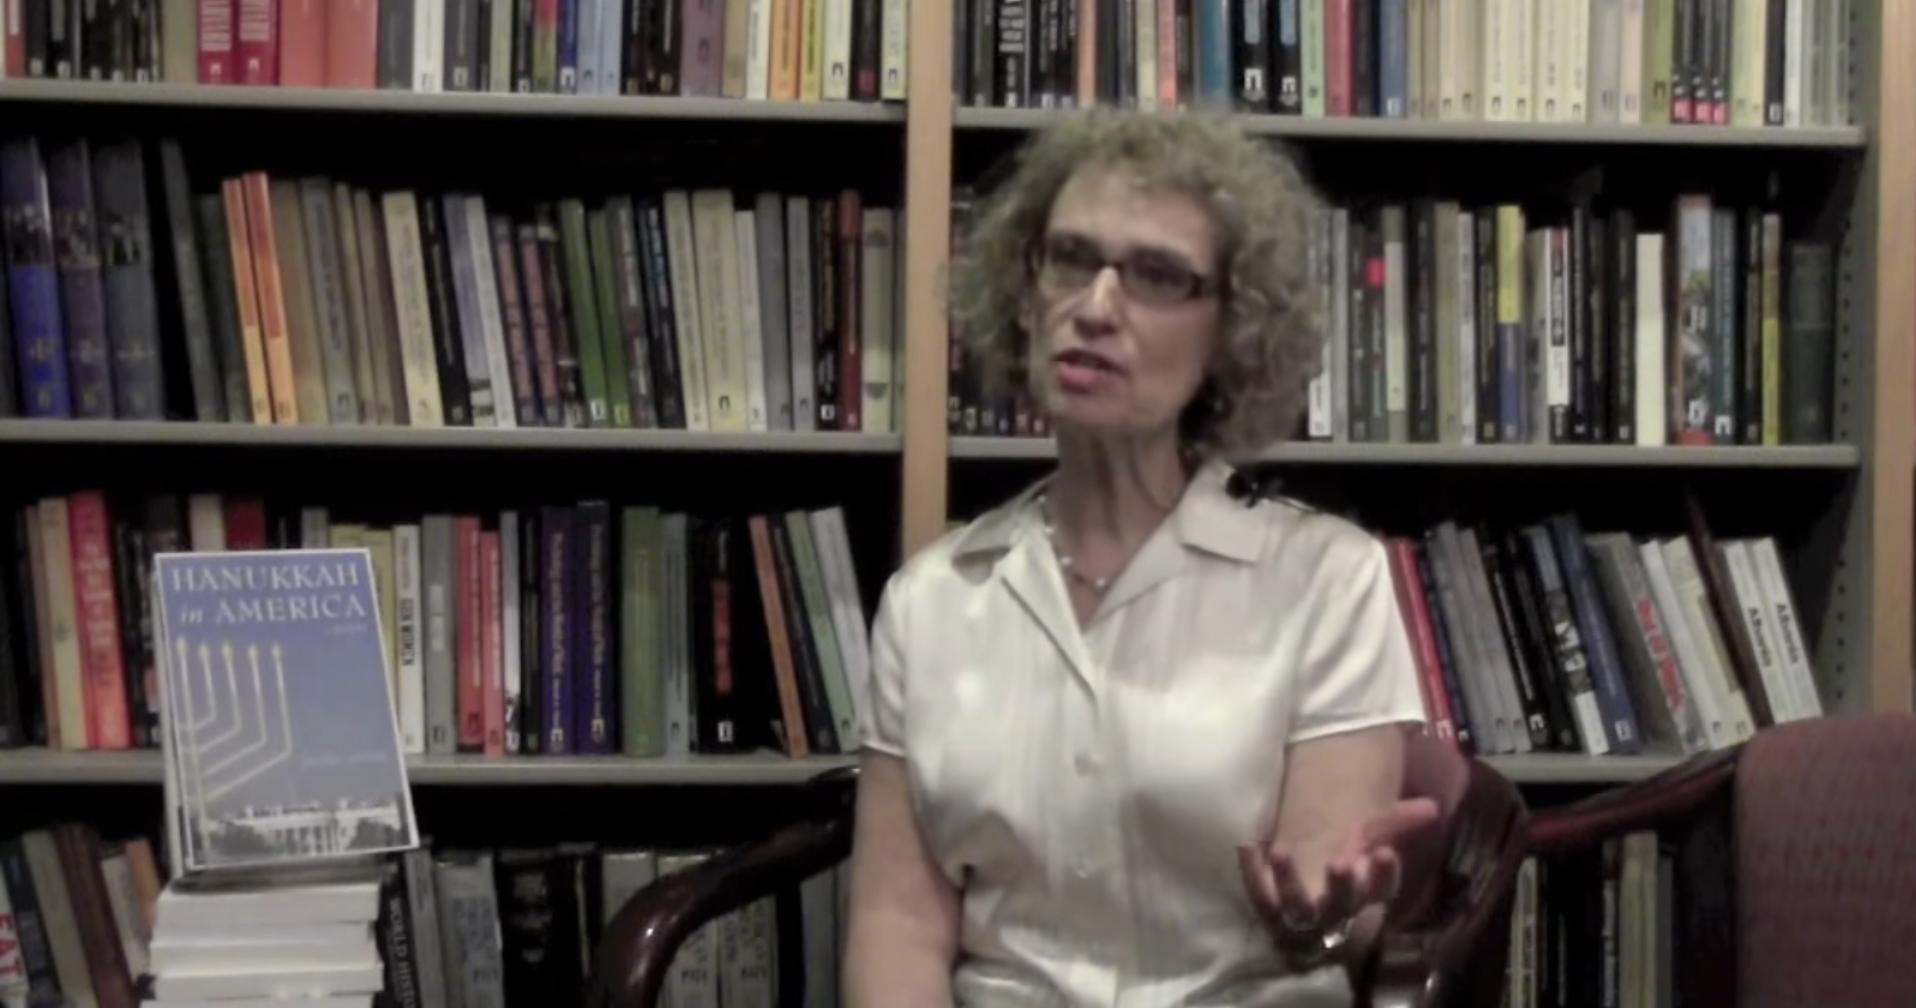 Episode 43: Hanukkah in America - Dianne Ashton